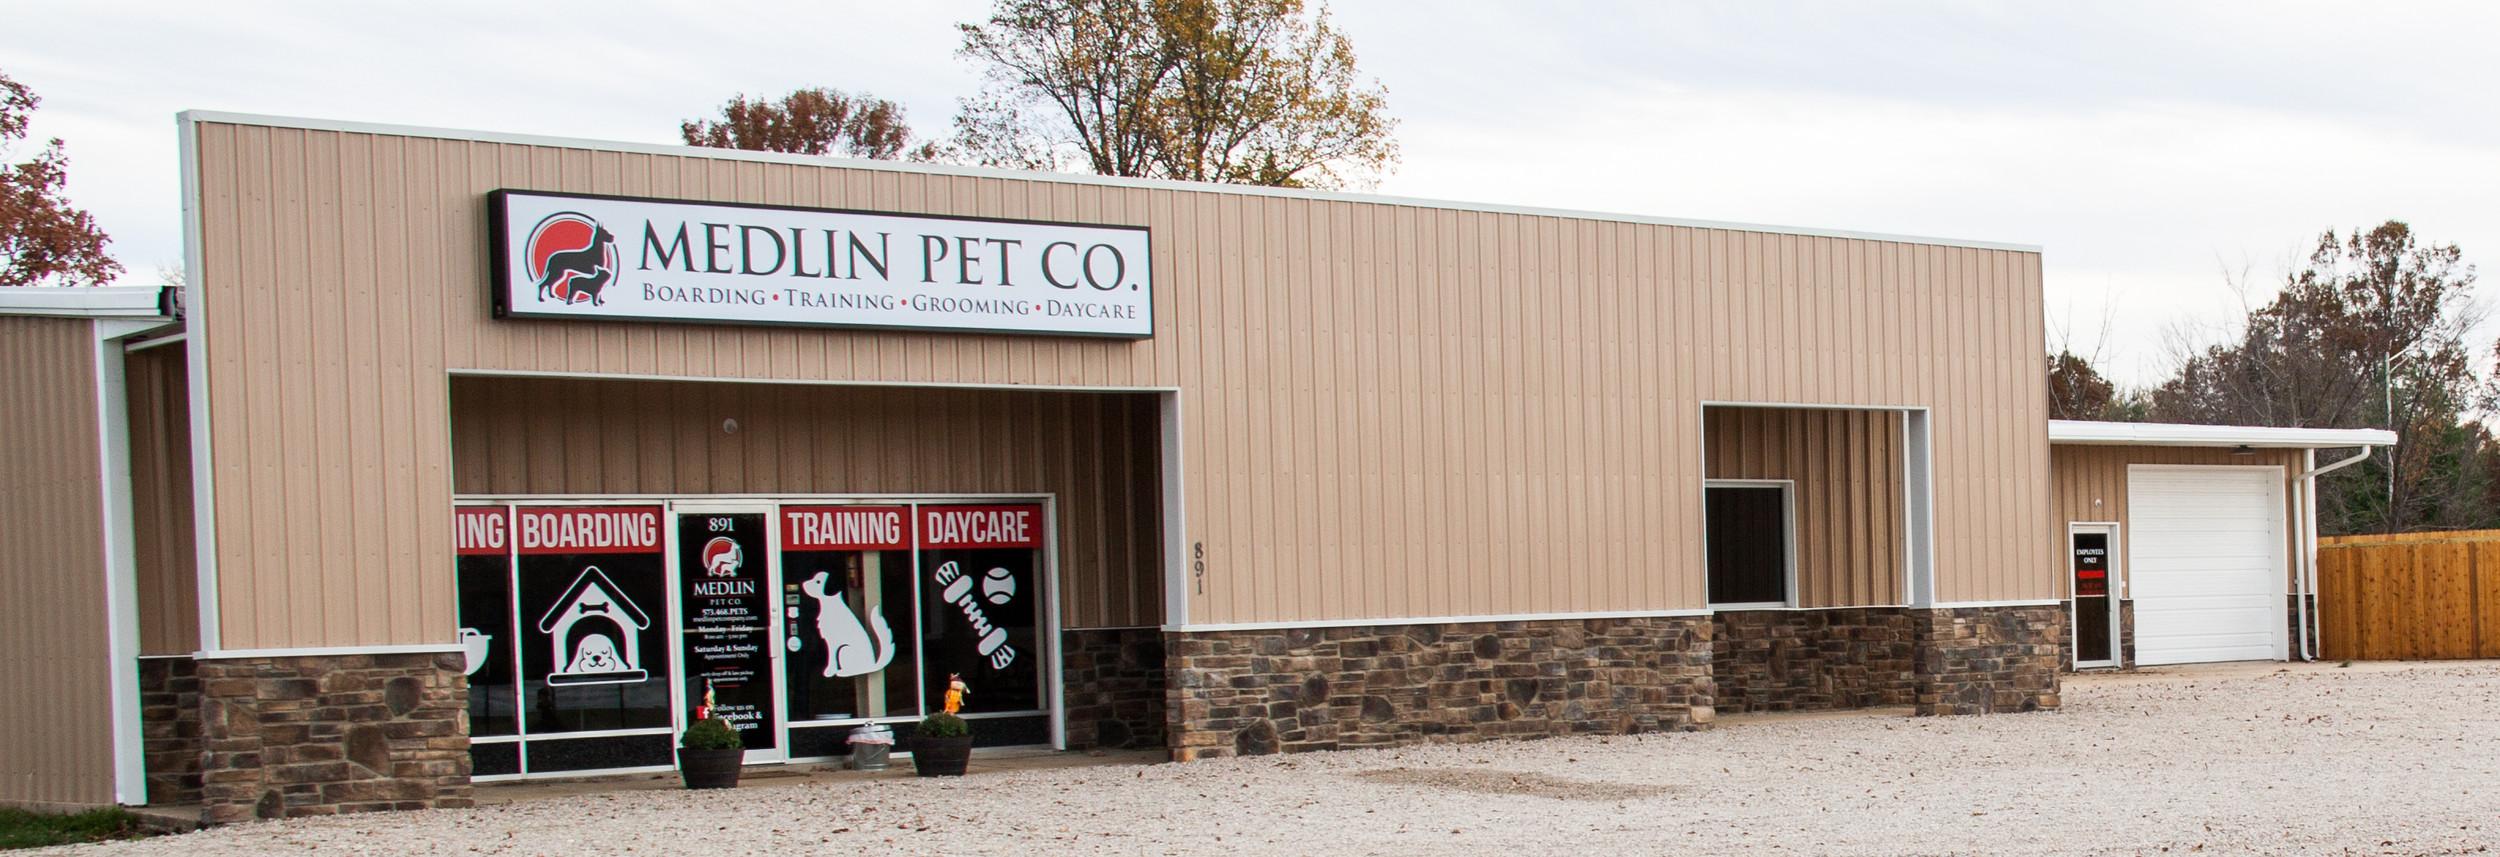 Medlin Pet Company | Boarding, Grooming, Training & Daycare